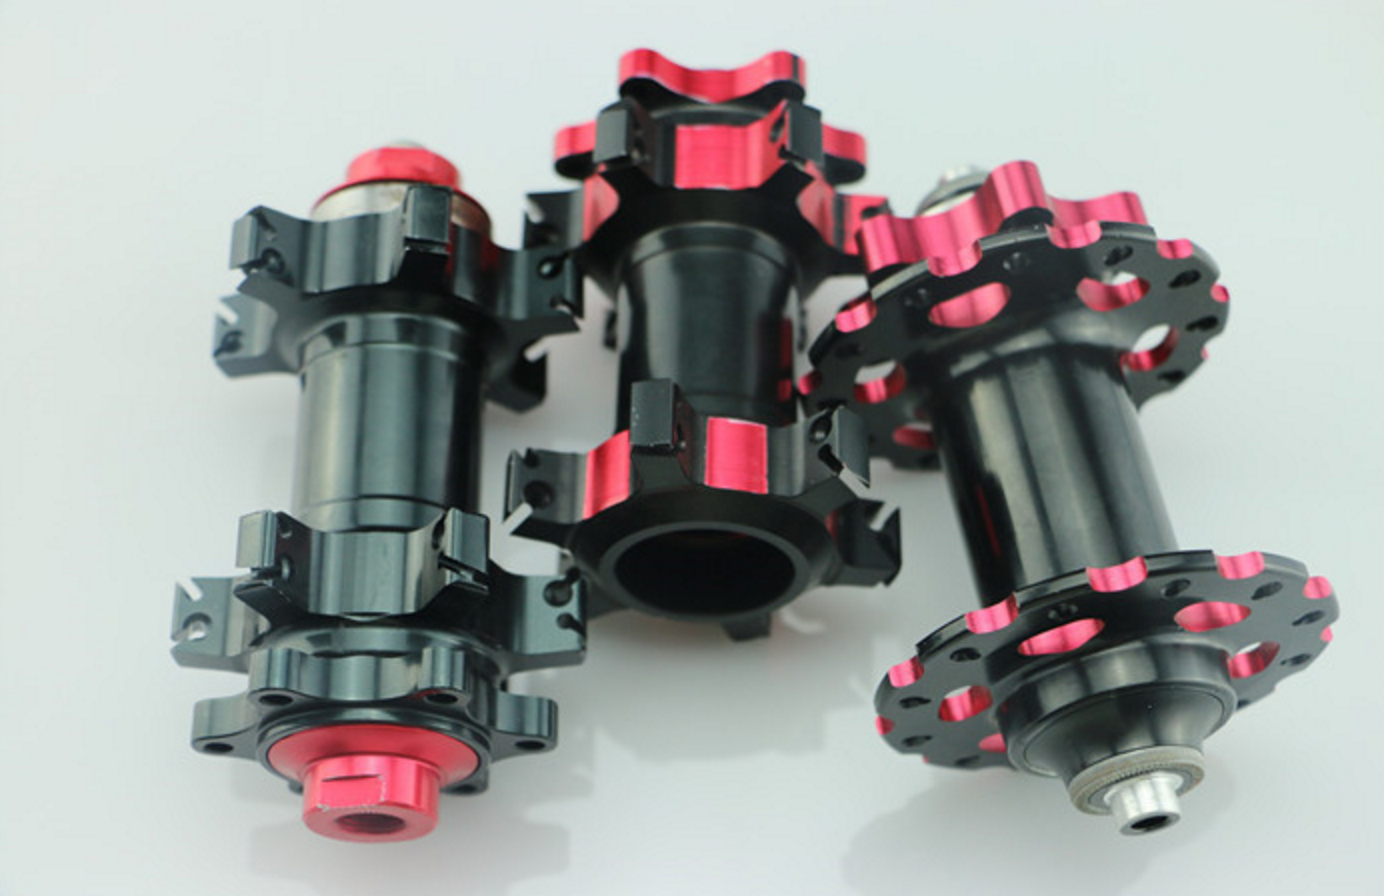 Figure 6 - CNC Machined Bike Parts